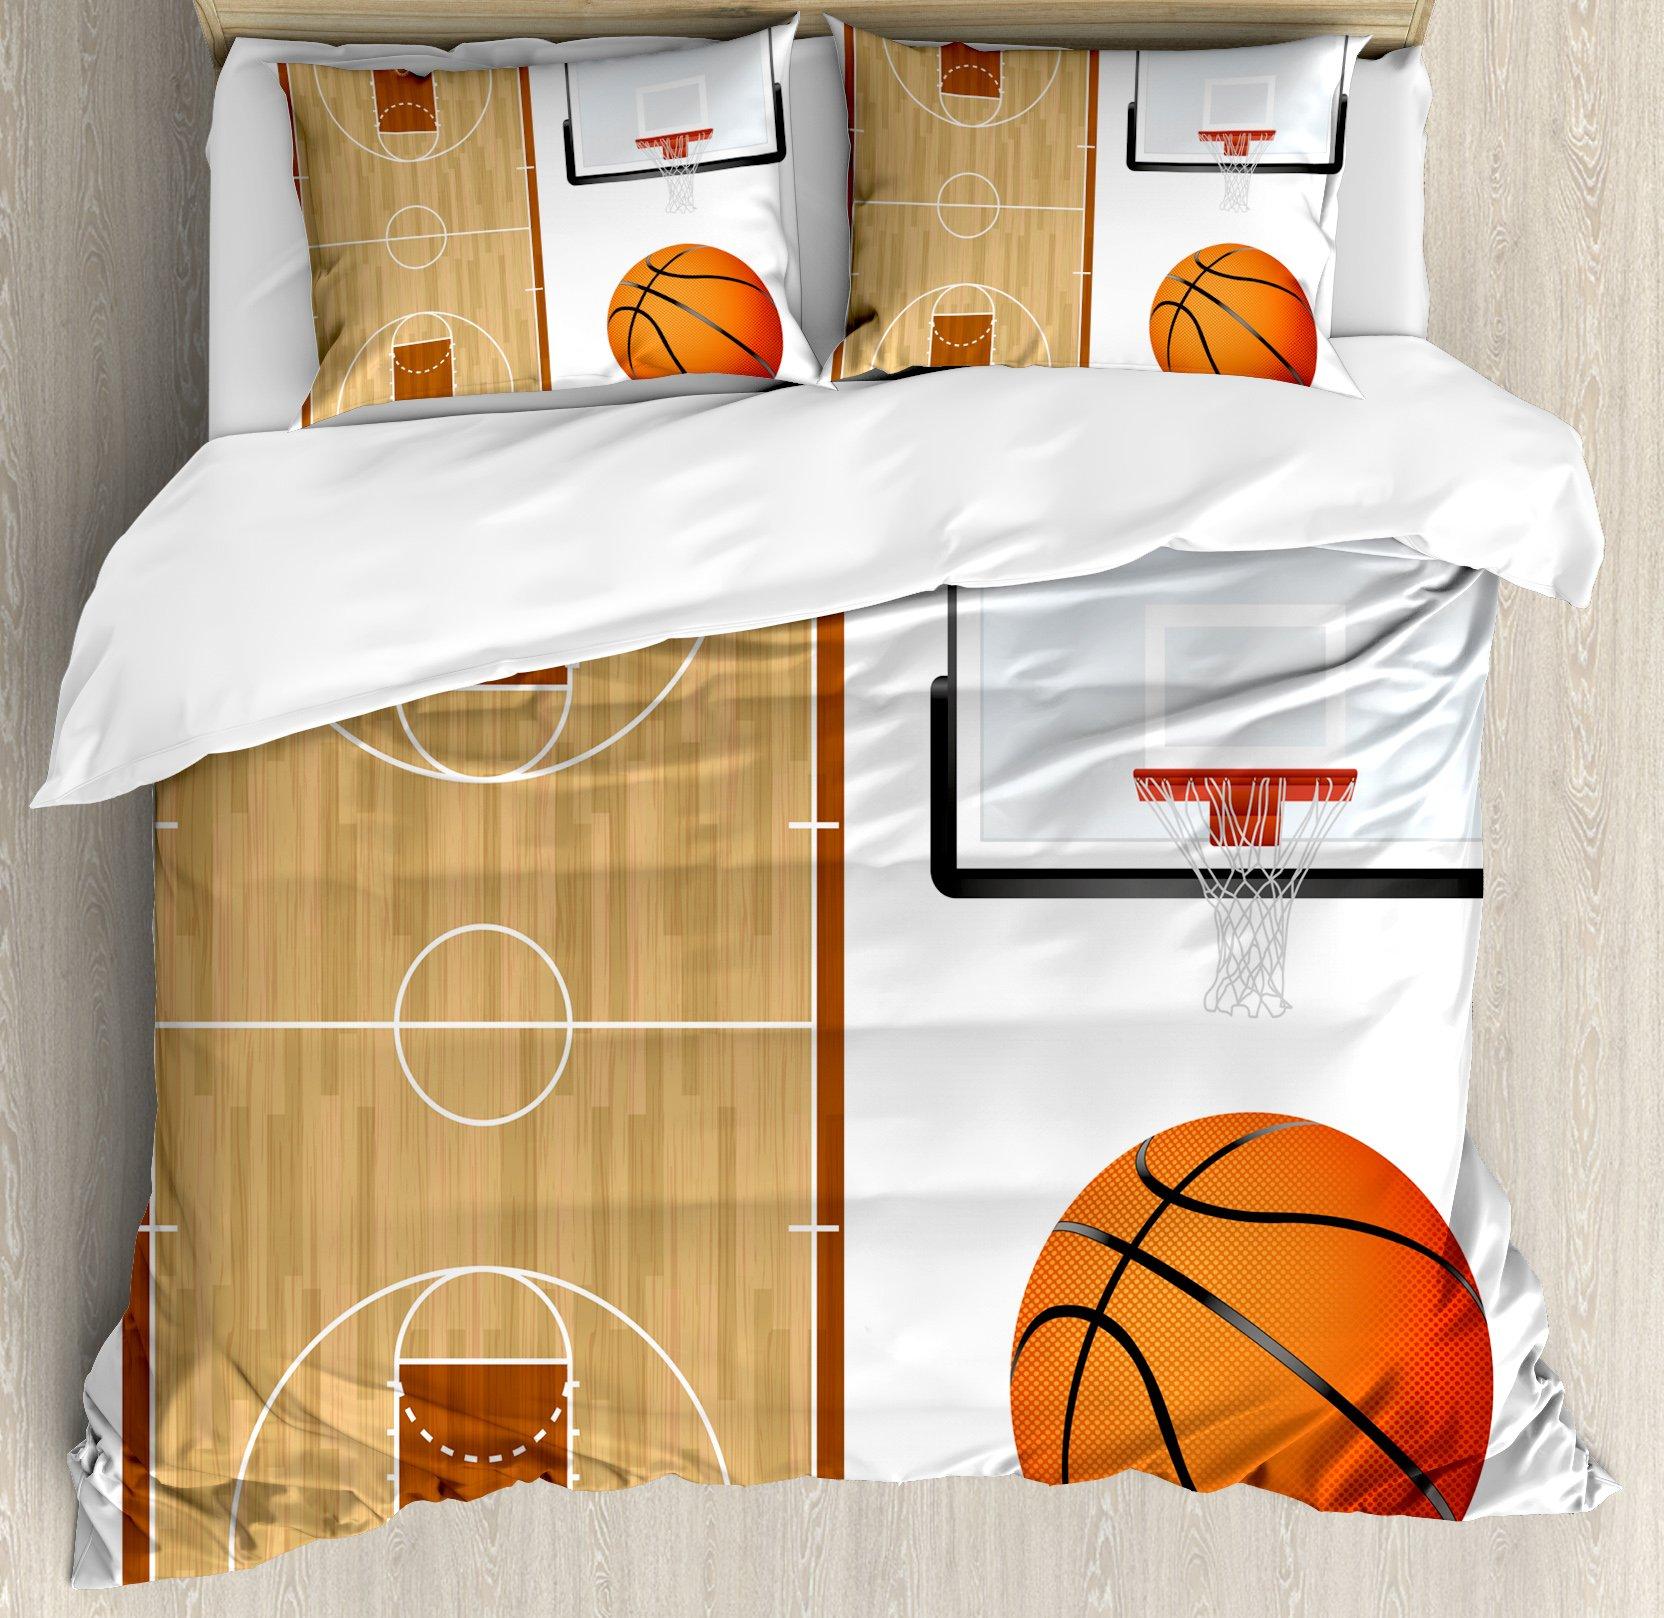 Lunarable Boy's Room Duvet Cover Set Queen Size, Basketball Court Backboard Illustration Realistic Sports Themed, Decorative 3 Piece Bedding Set with 2 Pillow Shams, Pale Brown Orange Black